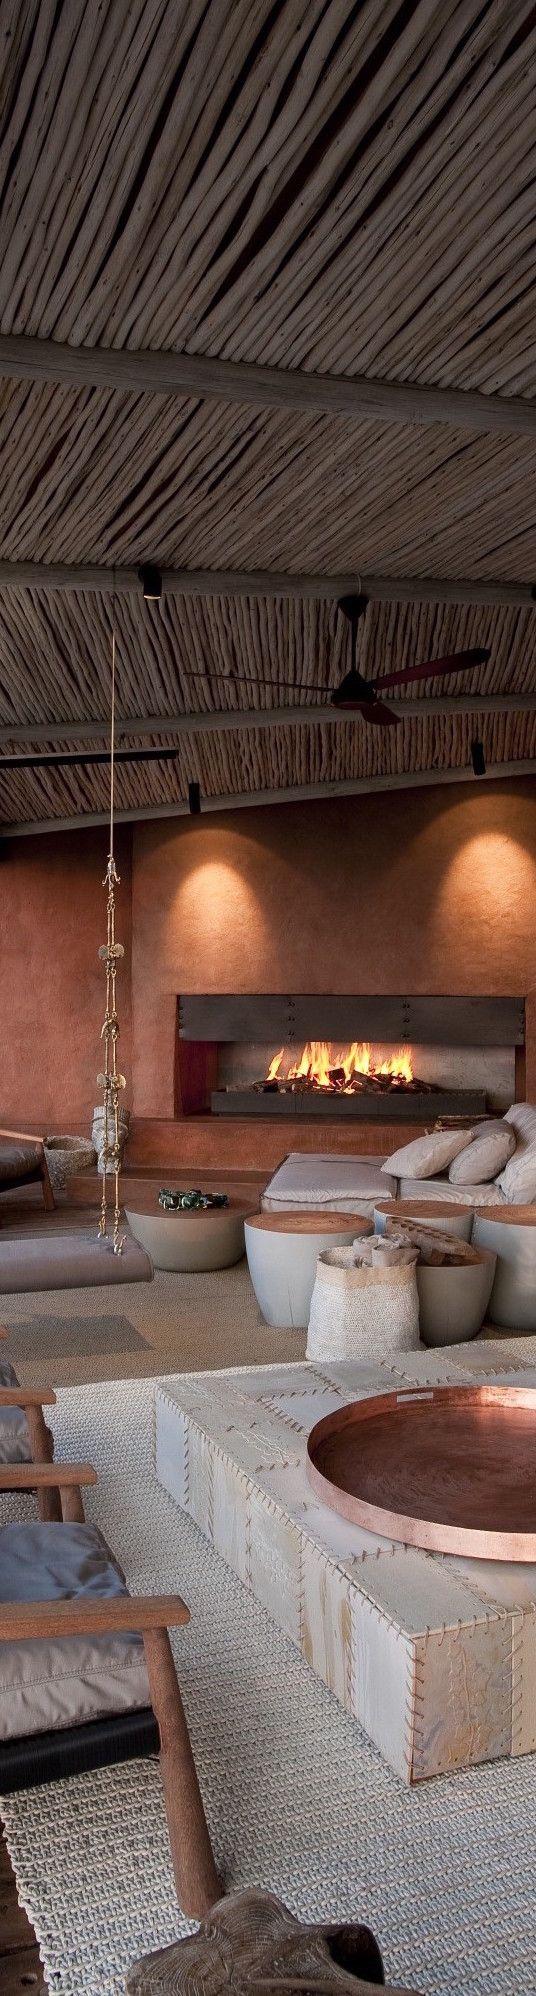 Leobo Private Reserve South Africa | LOLO❤︎